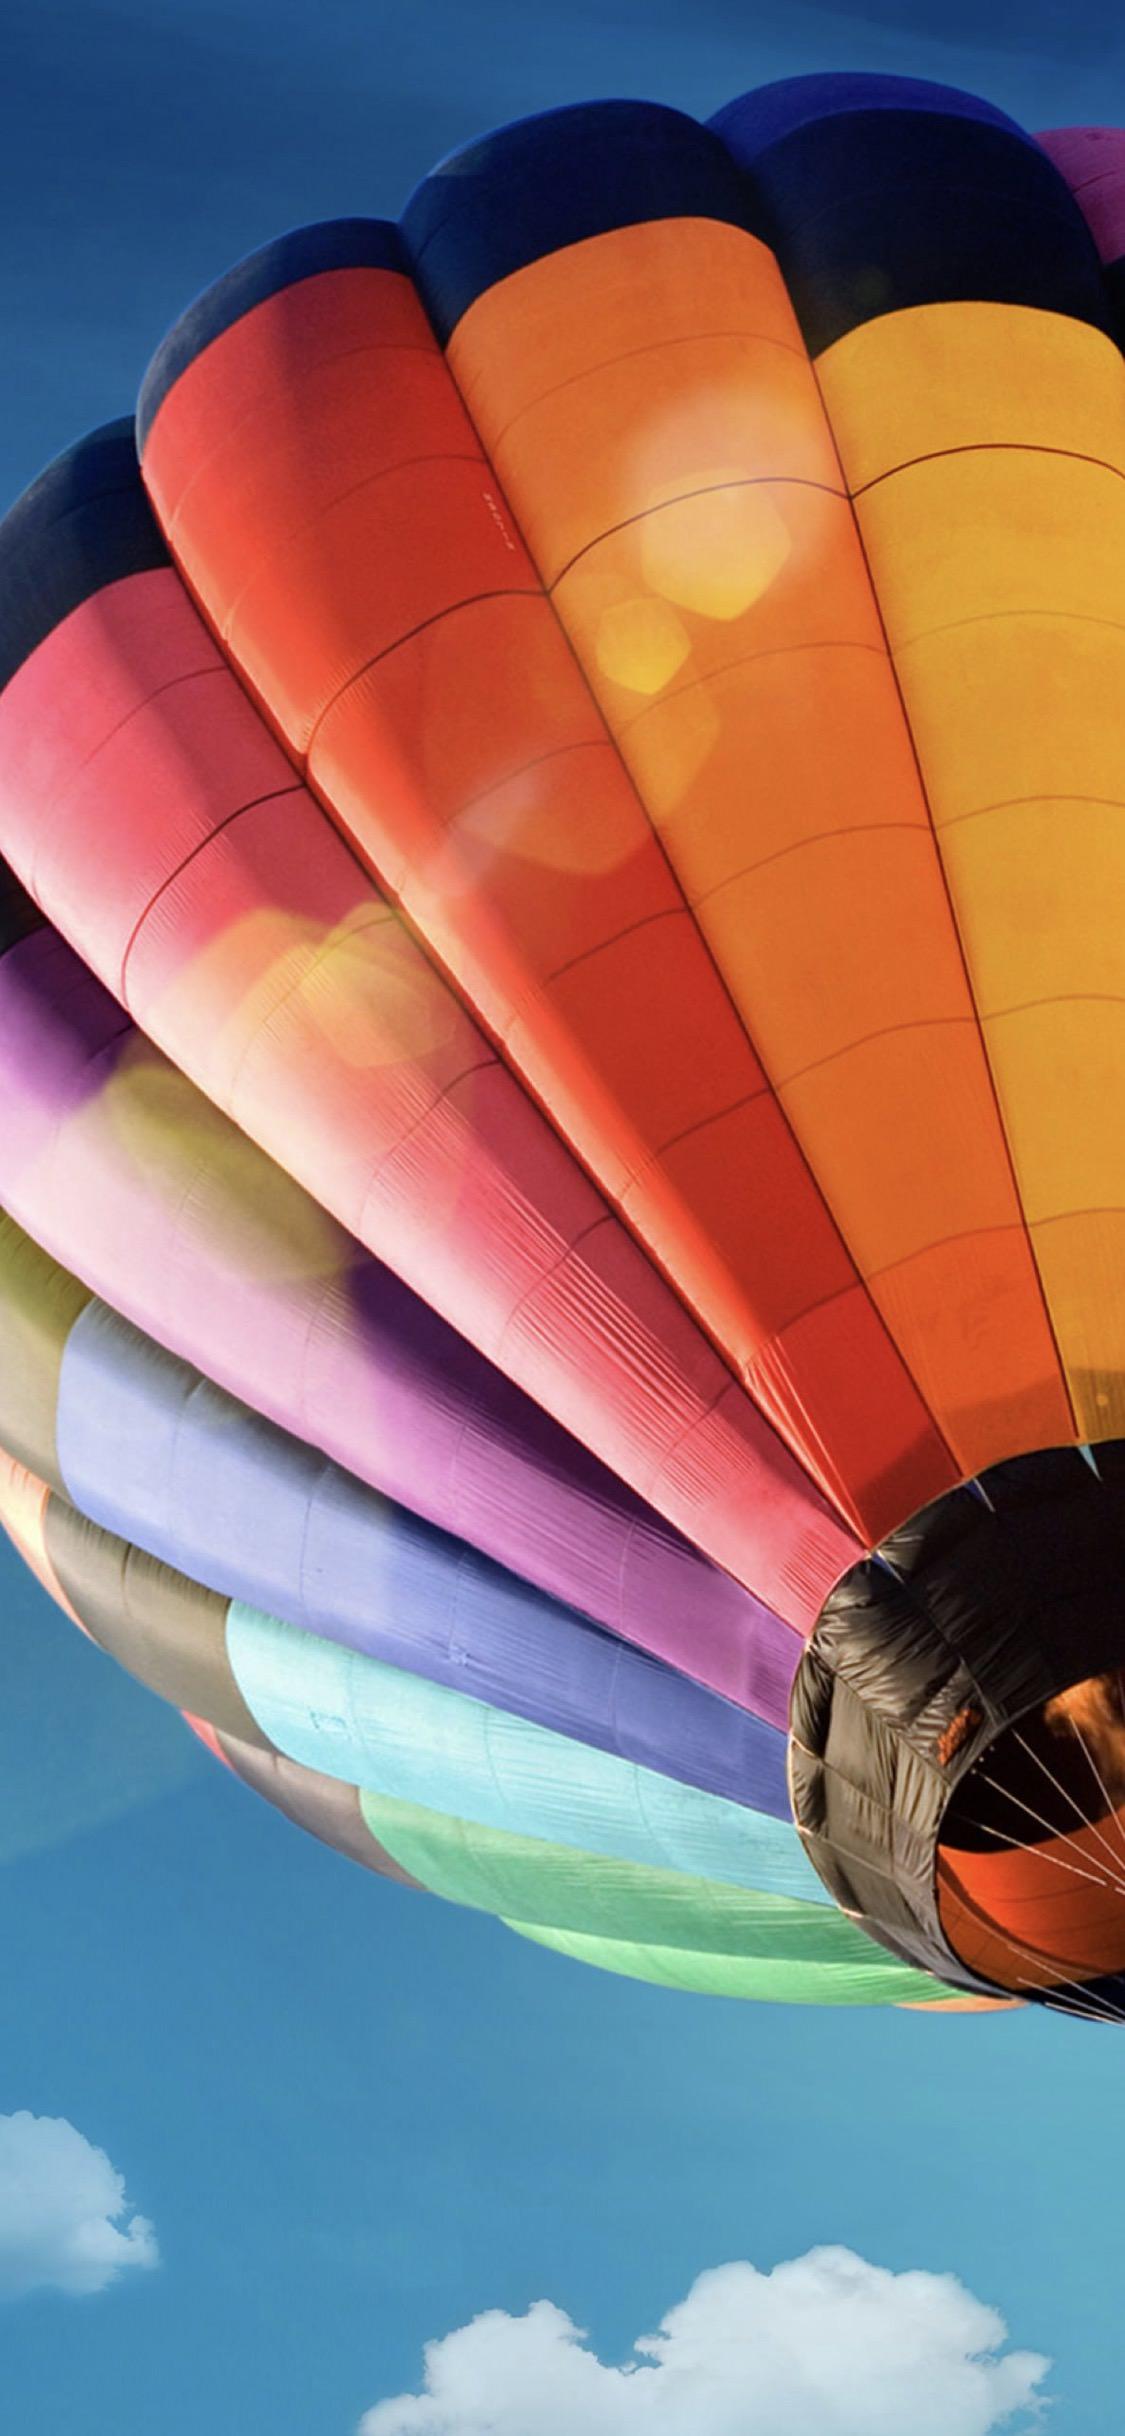 Balloon Colorful Blue Sky Wallpaper Sc Iphonexs